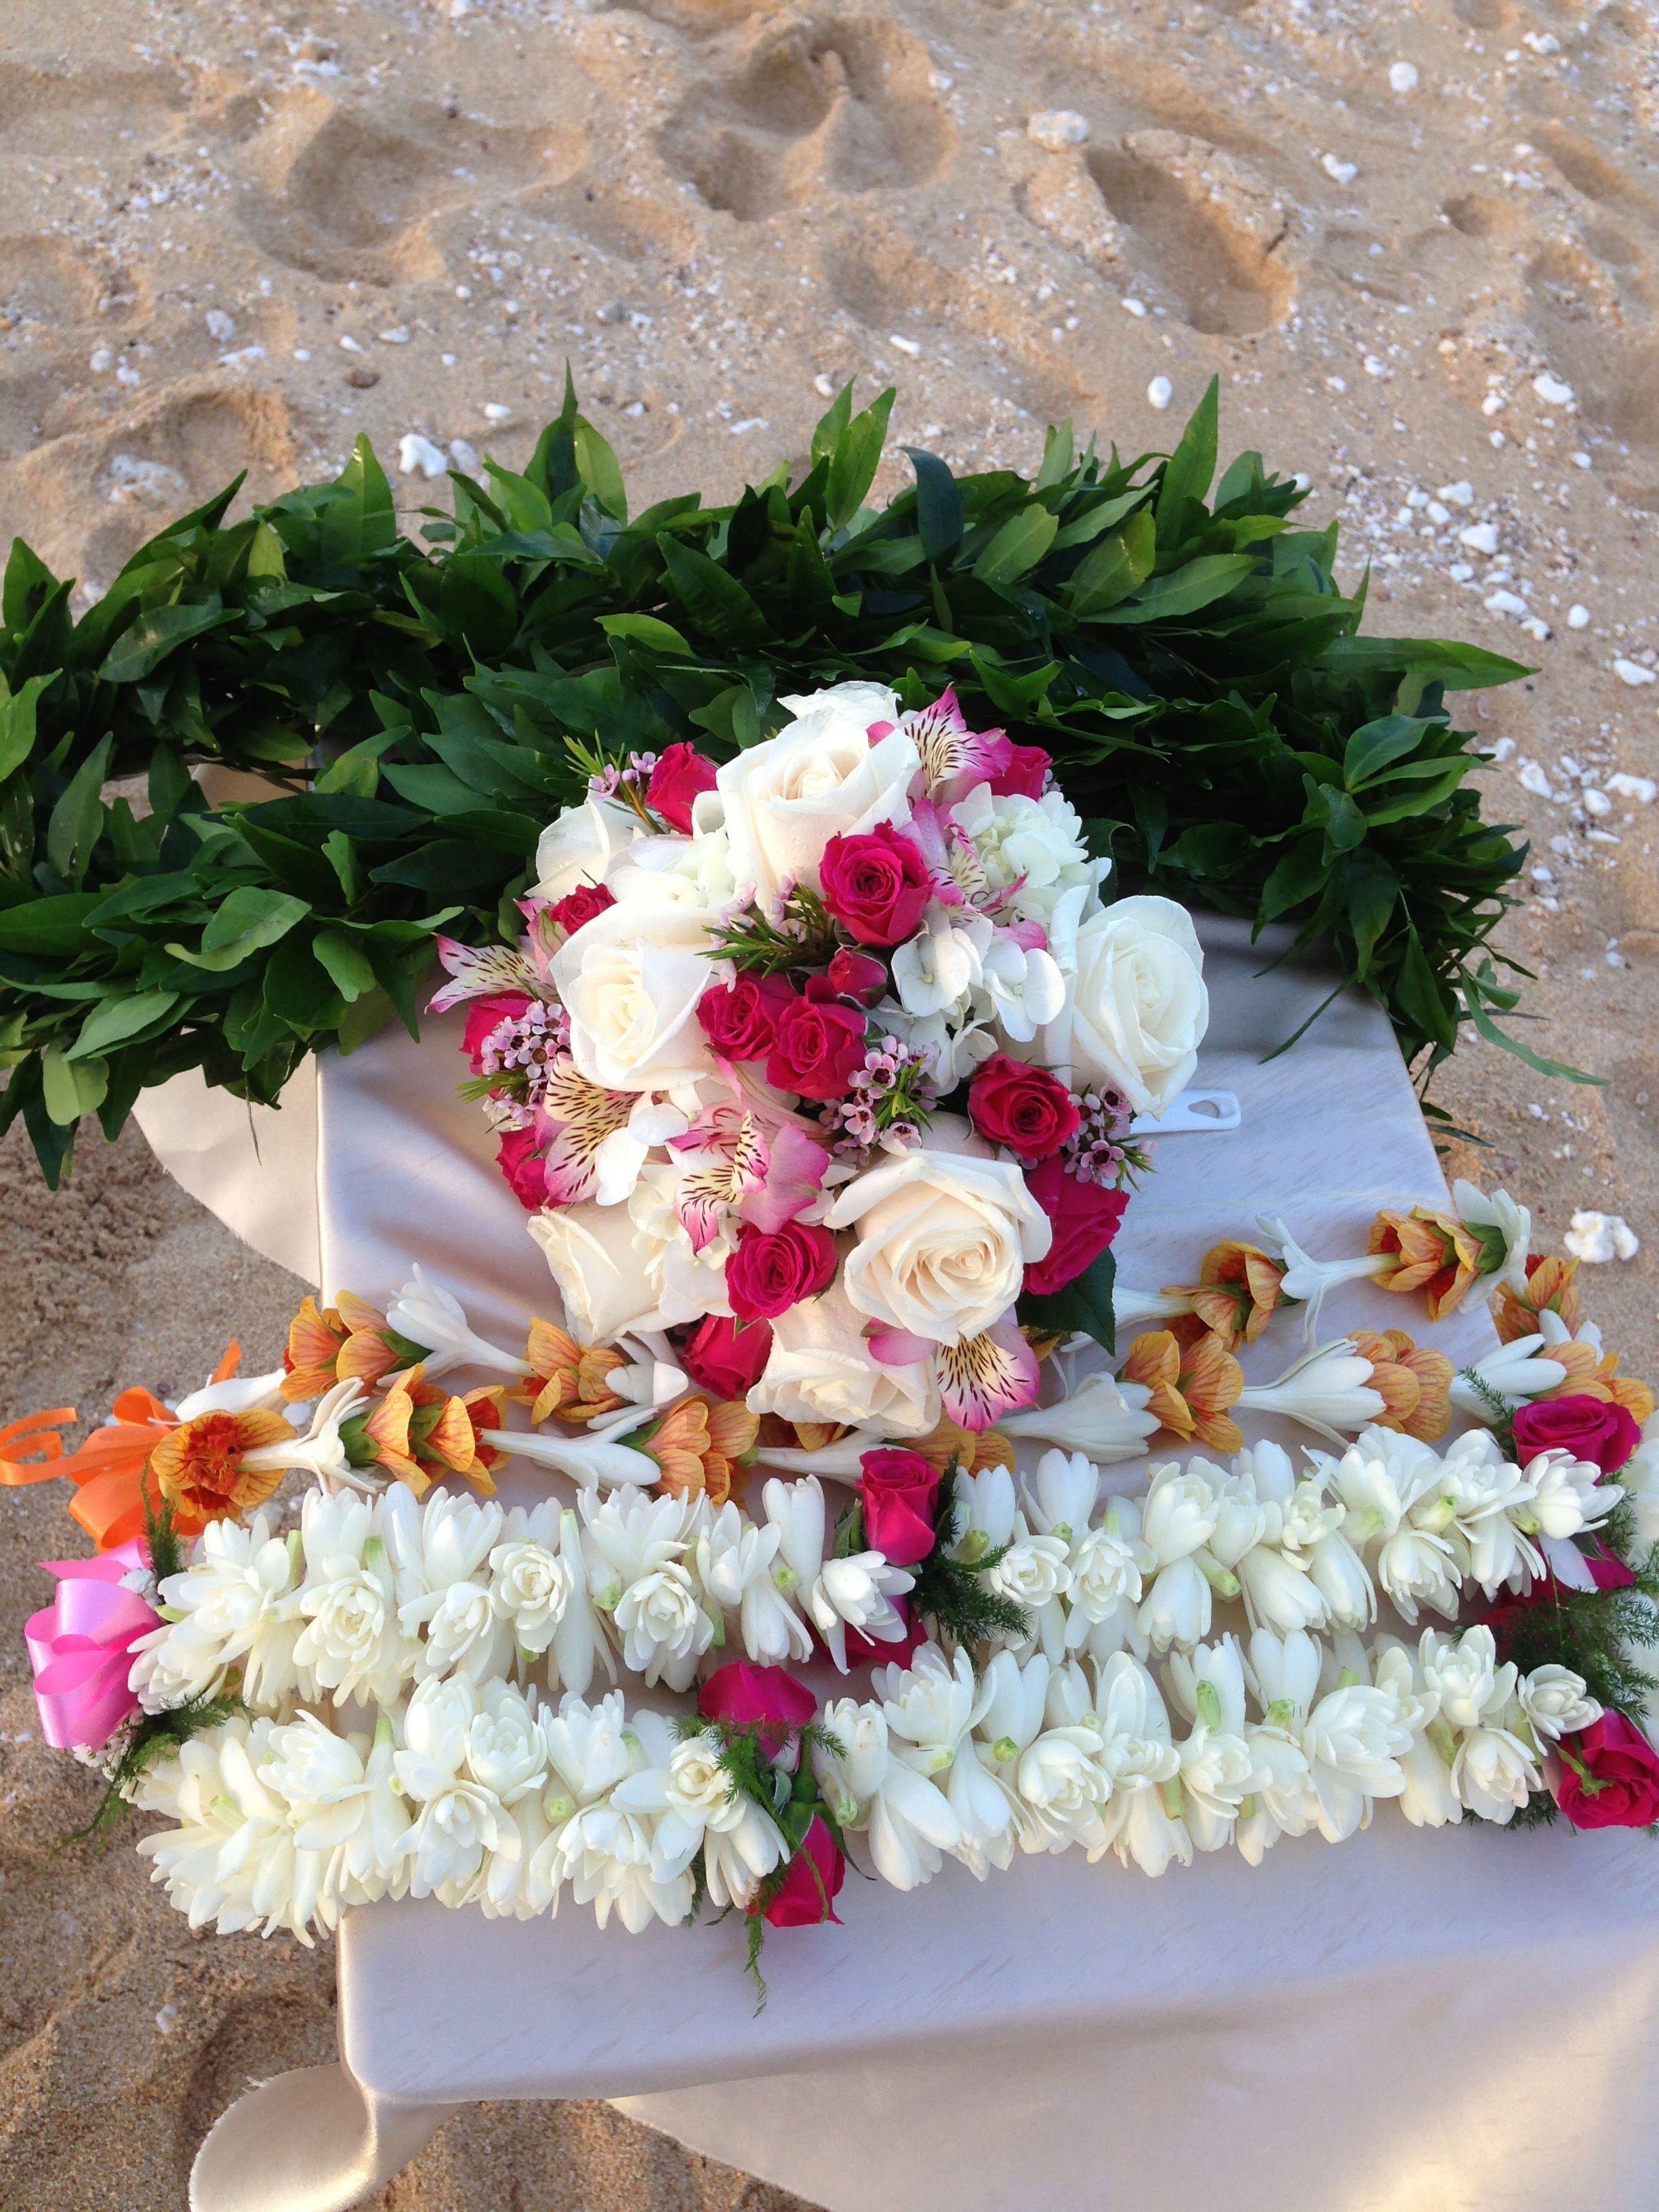 Islander weddings in honolulu hawaii provides colorful flower islander weddings in honolulu hawaii provides colorful flower bouquets and beautiful leis made of tuberose izmirmasajfo Images